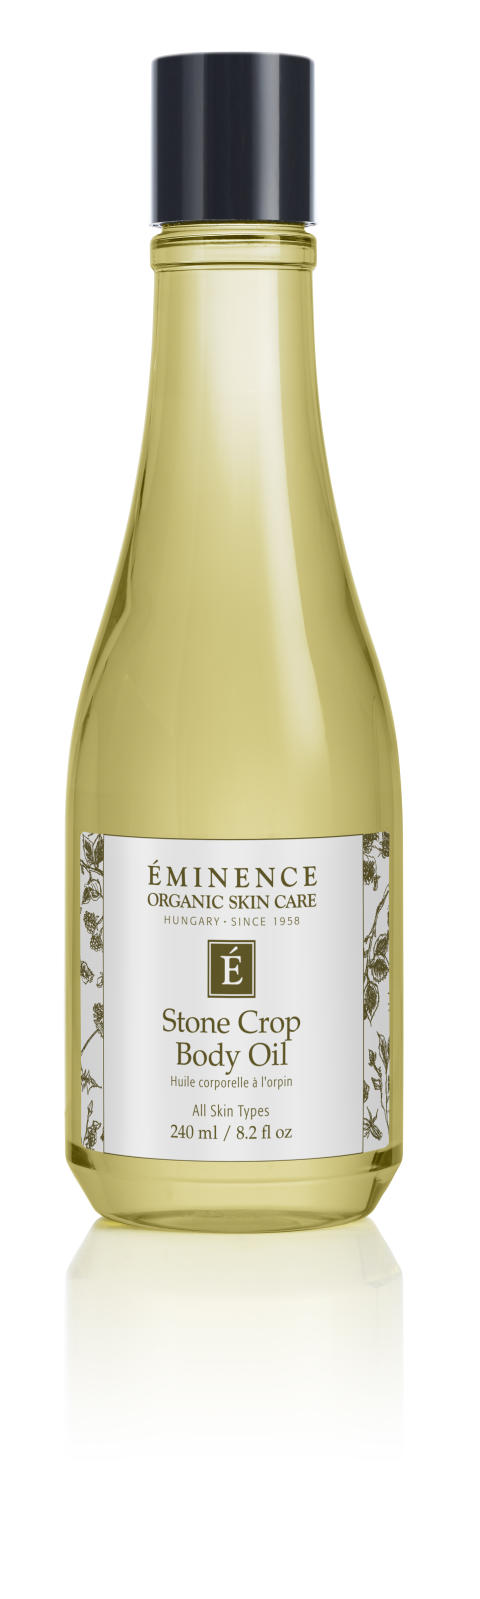 Éminence Organics - Stone Crop Body Oil